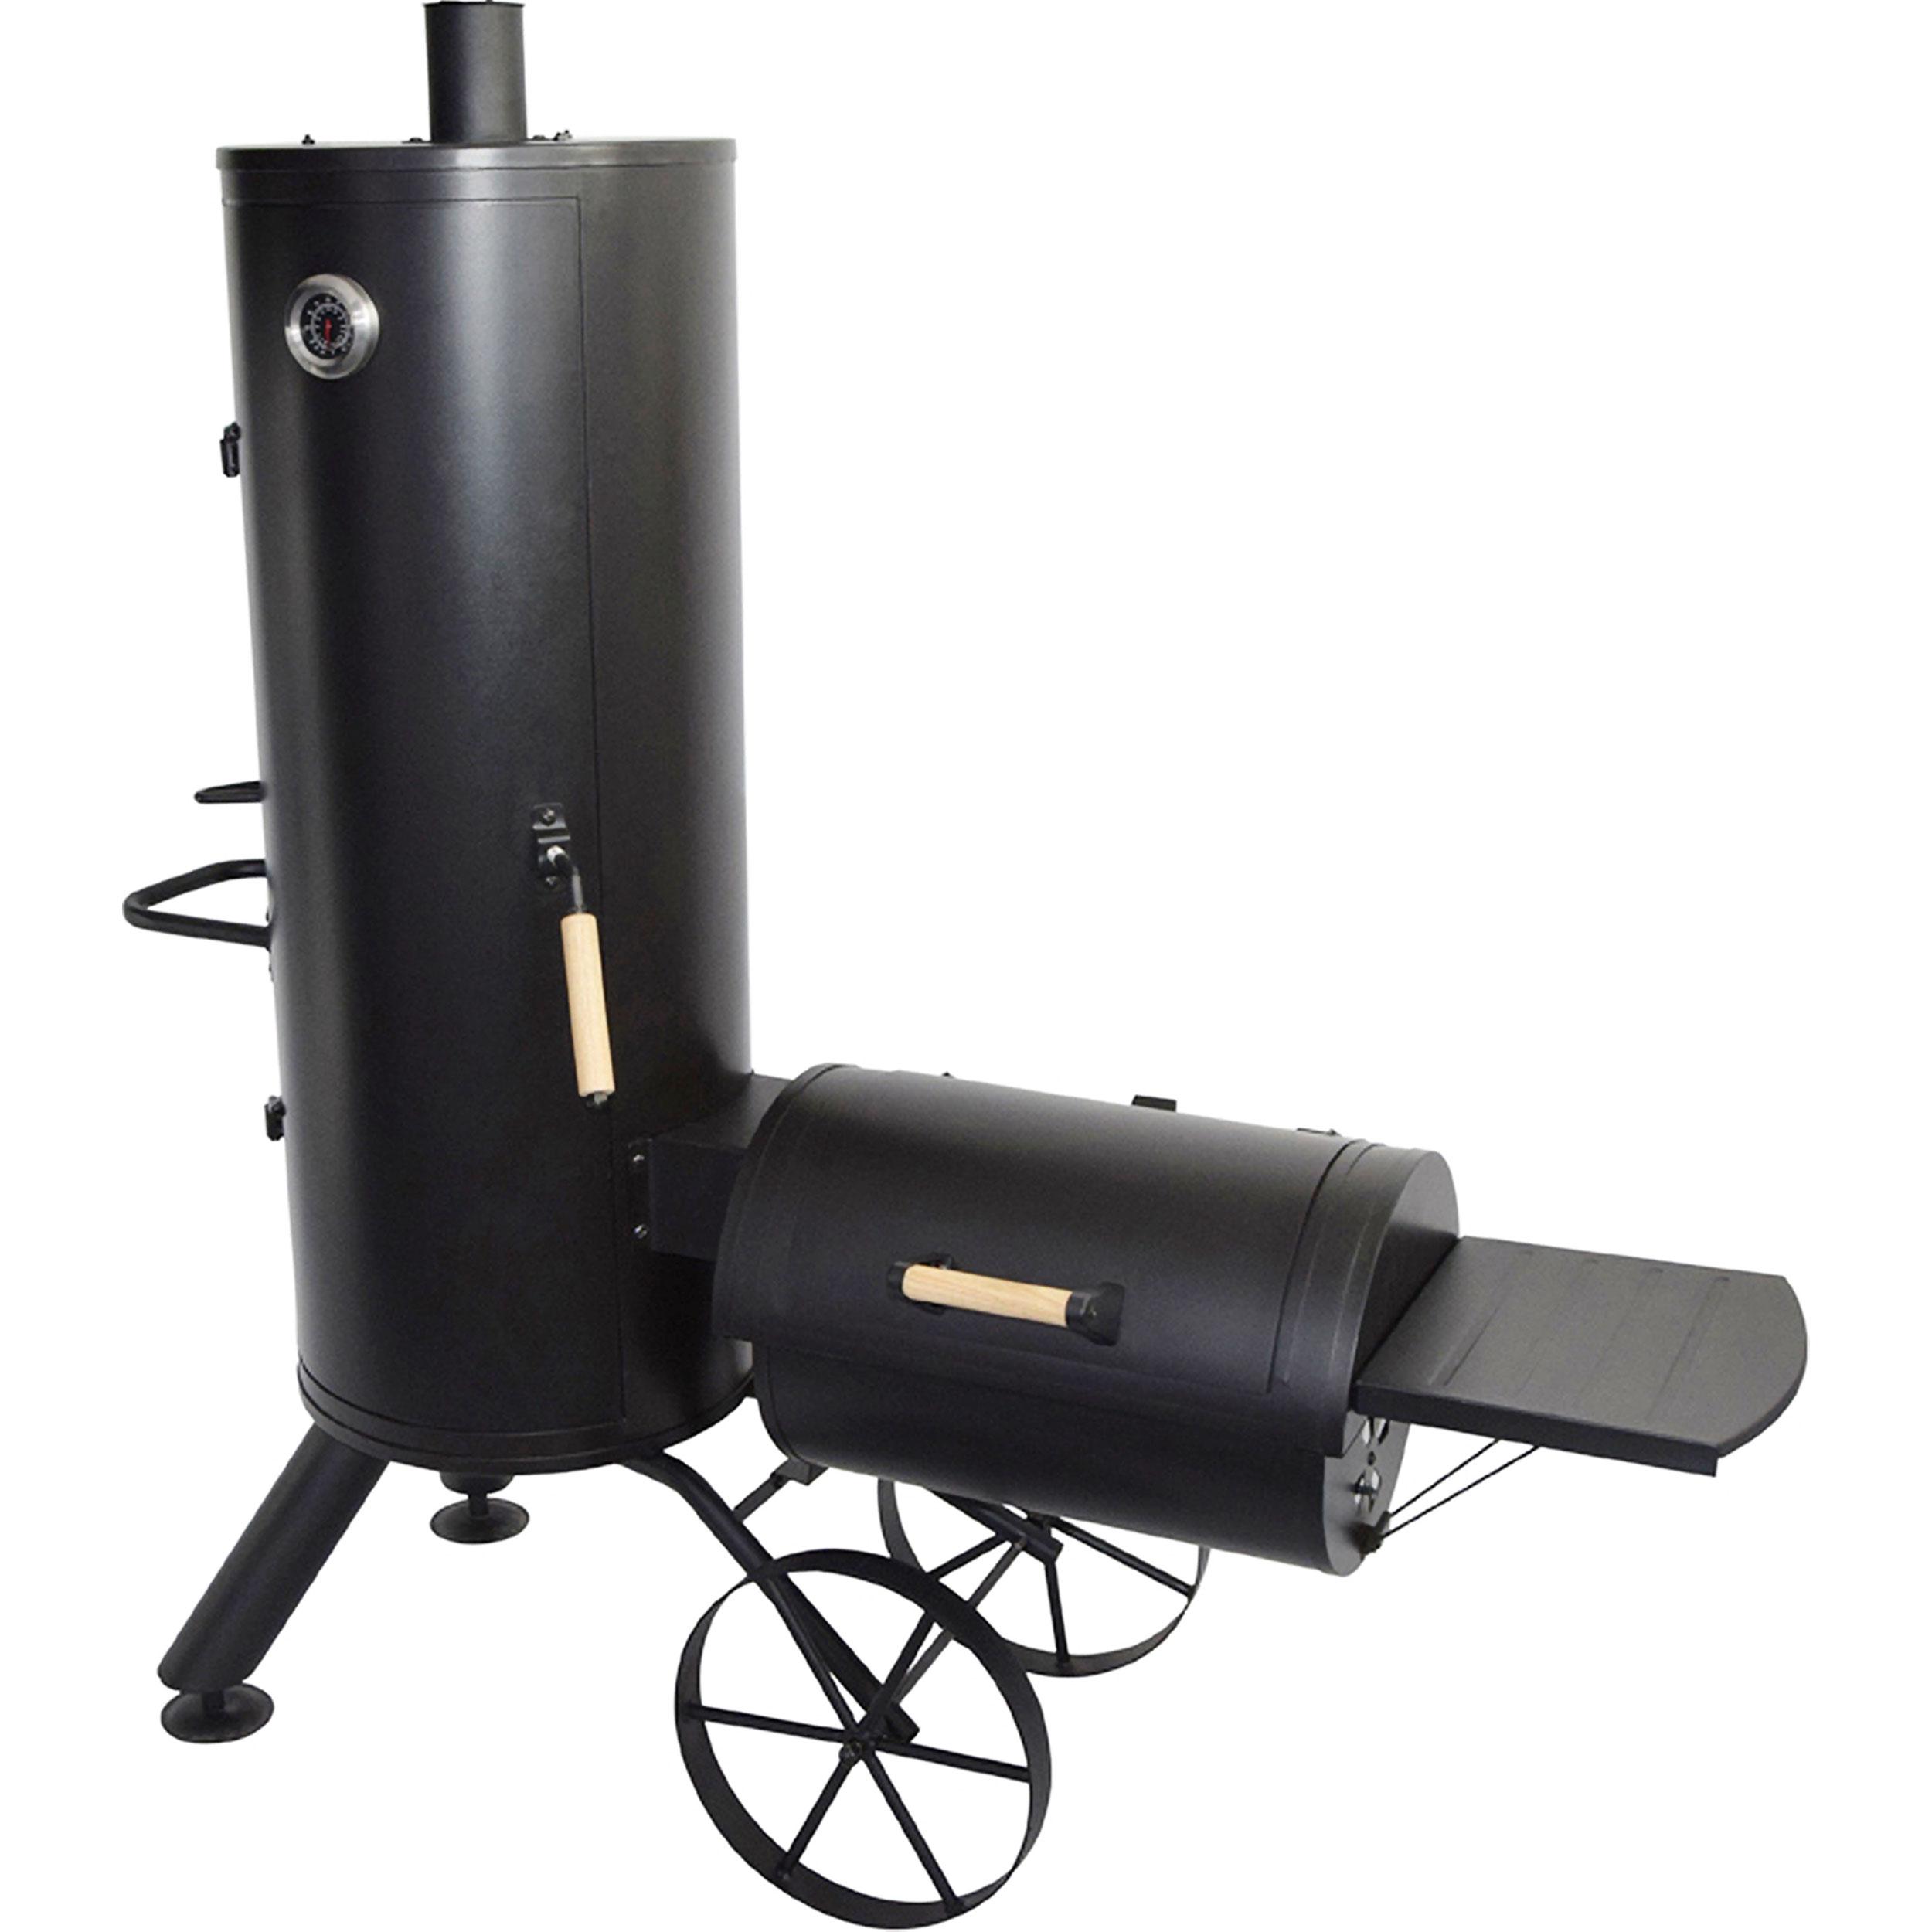 r uchern smoken hm hei e metallwaren grillwagen terrassenheizer gasgrills. Black Bedroom Furniture Sets. Home Design Ideas